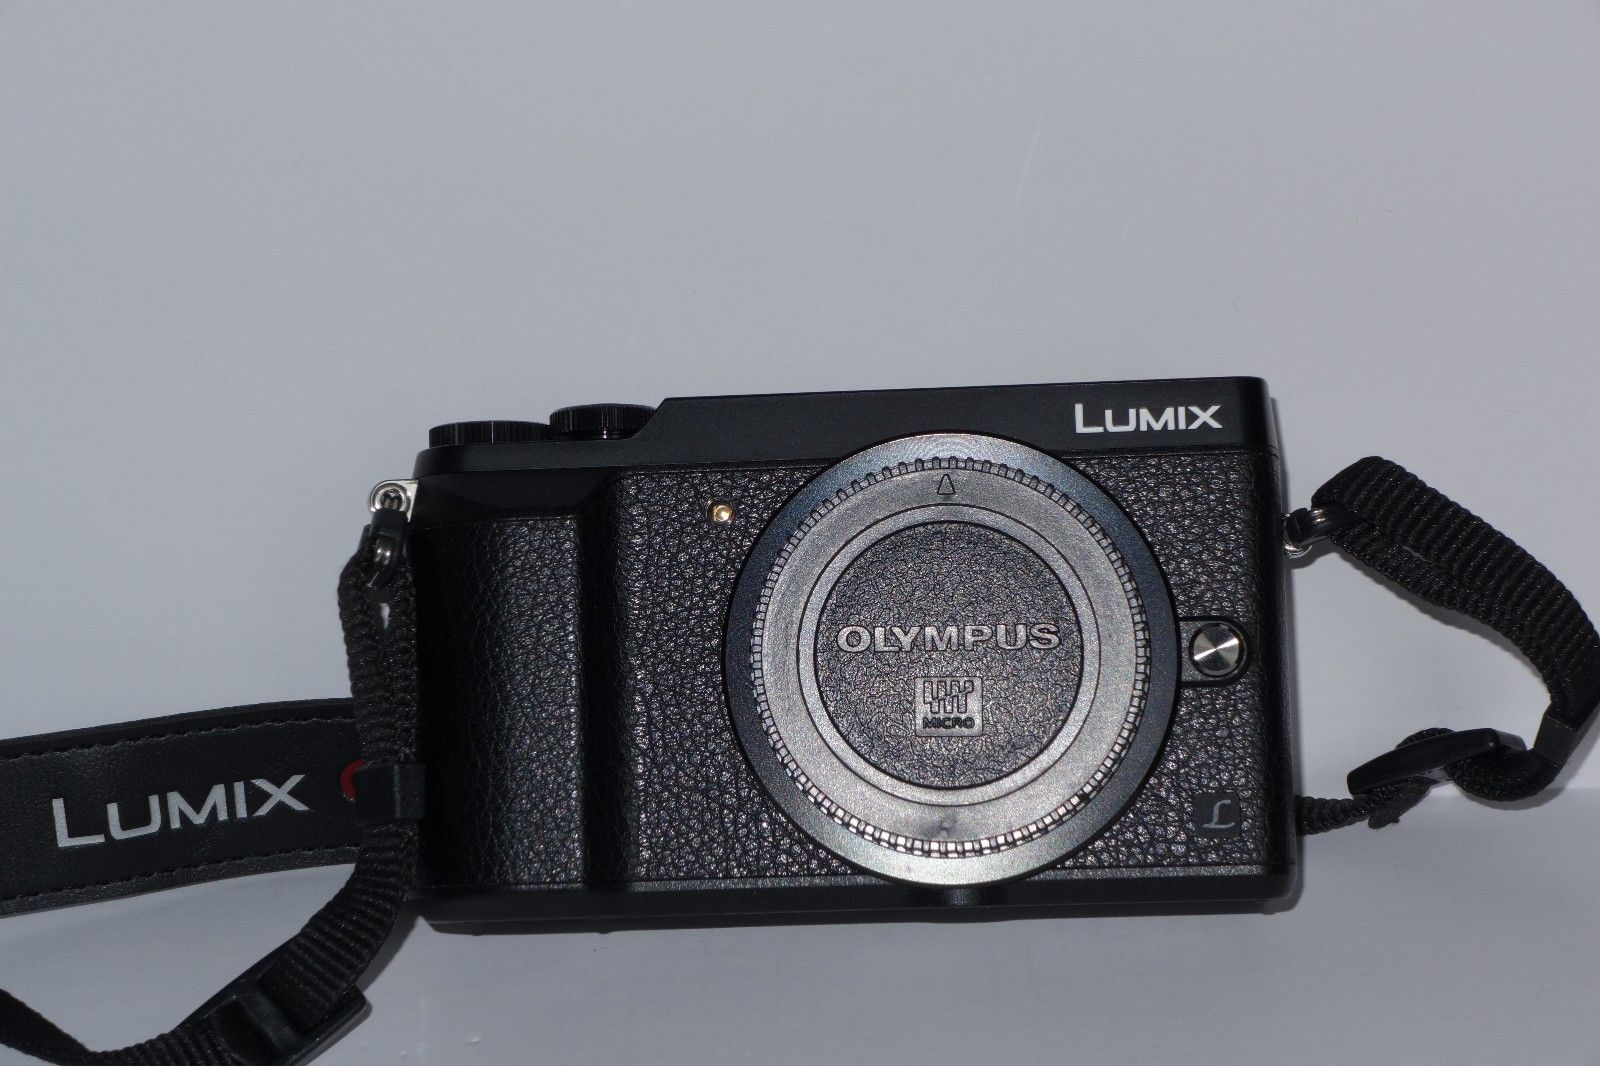 Panasonic LUMIX GX80 16.0MP Digitalkamera - Schwarz neuwertig ohne Objektive